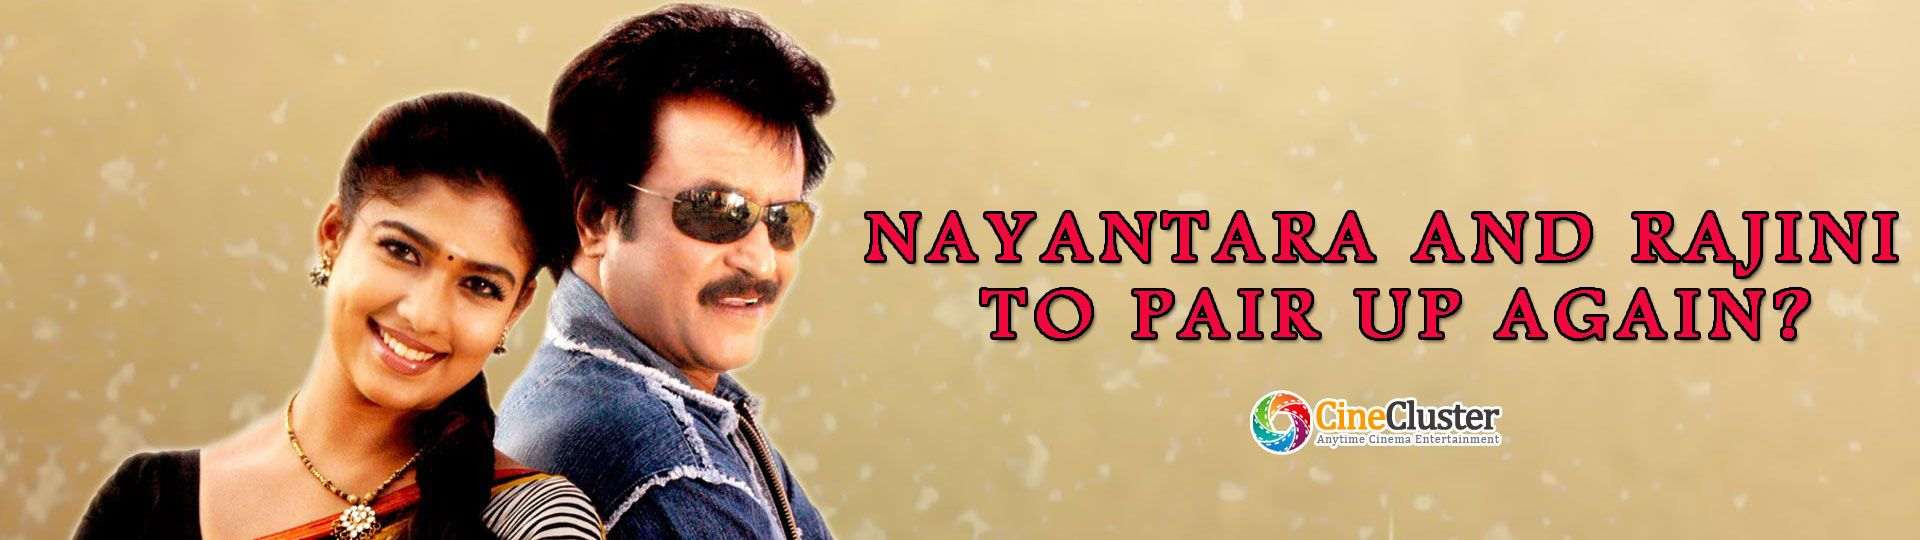 Nayanthara and Rajini to pair up again?